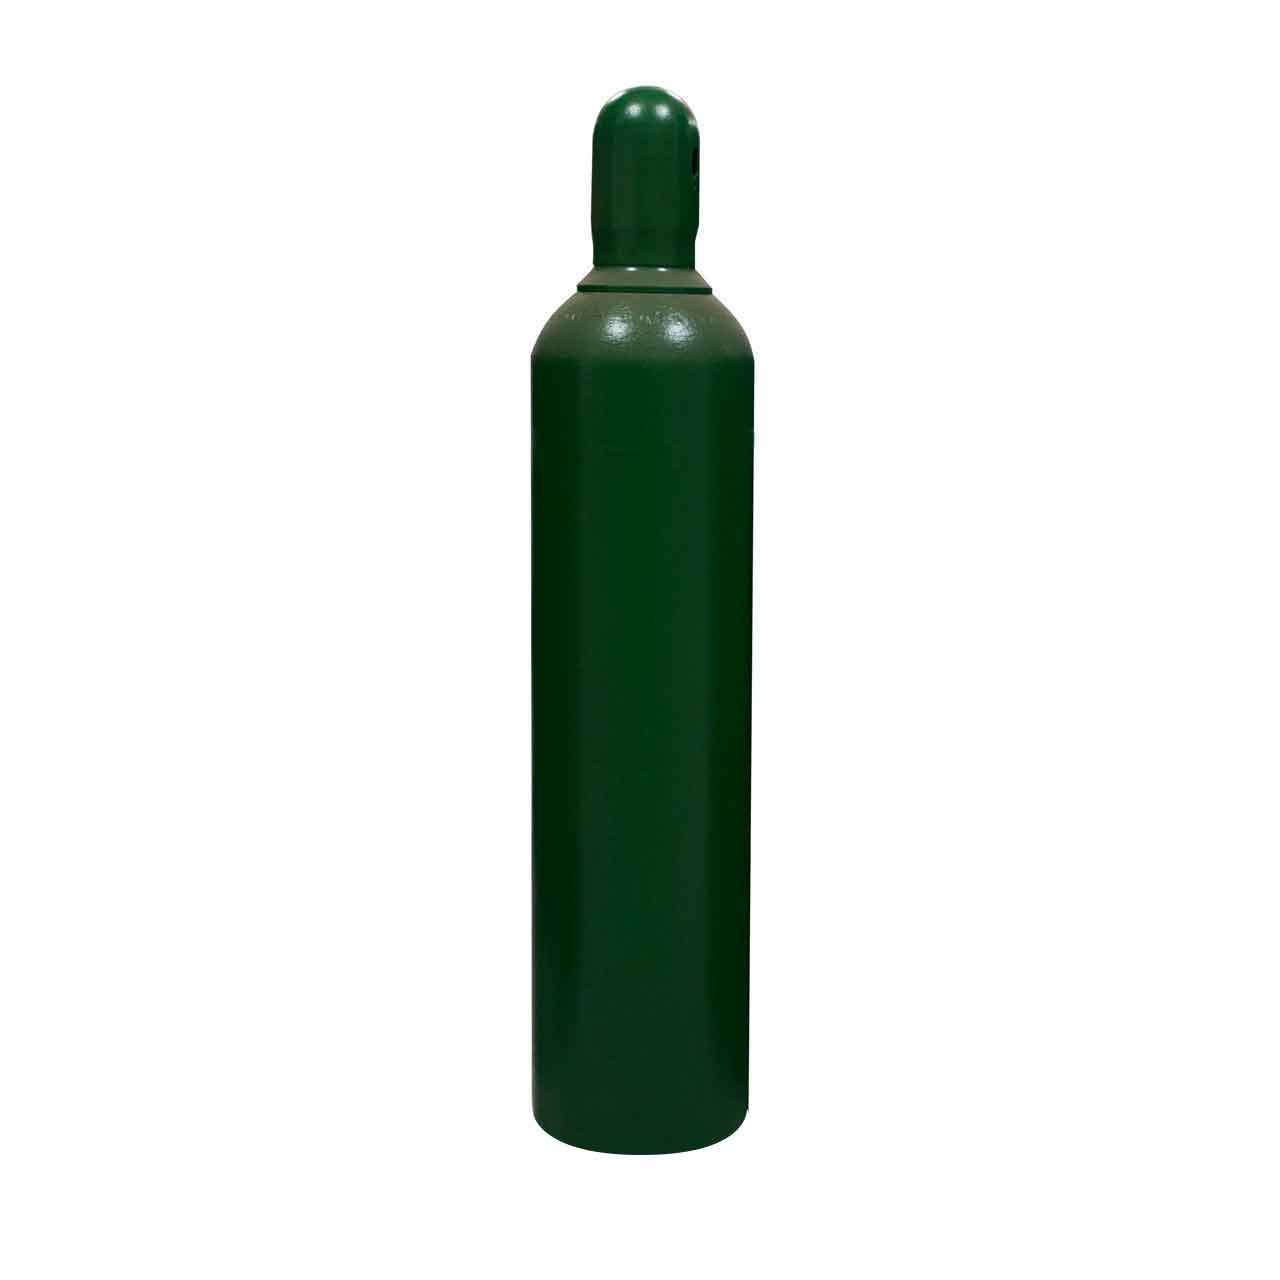 80 cu/ft Oxygen Welding Gas Cylinder Tank CGA 540 - EMPTY Weldfabulous